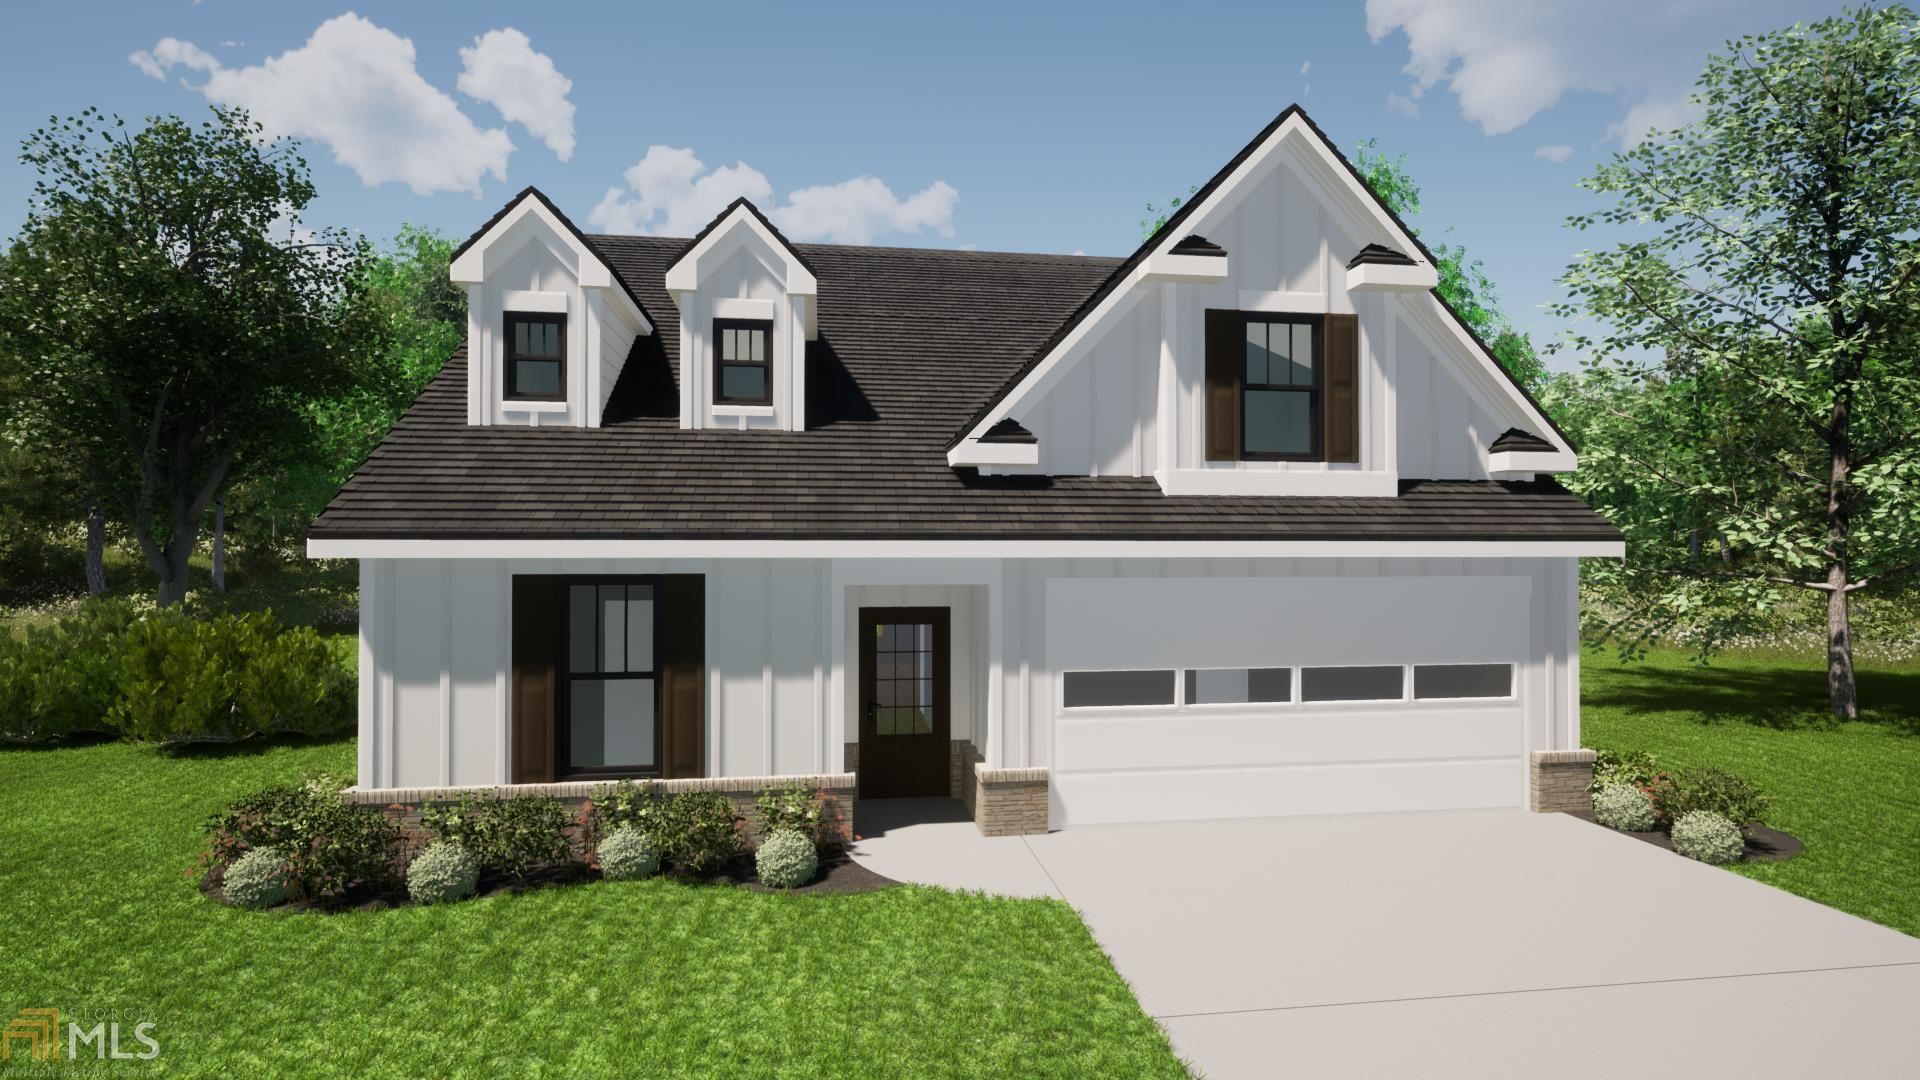 110 Pleasantdale Dr, Demorest, GA 30535 - #: 8838954